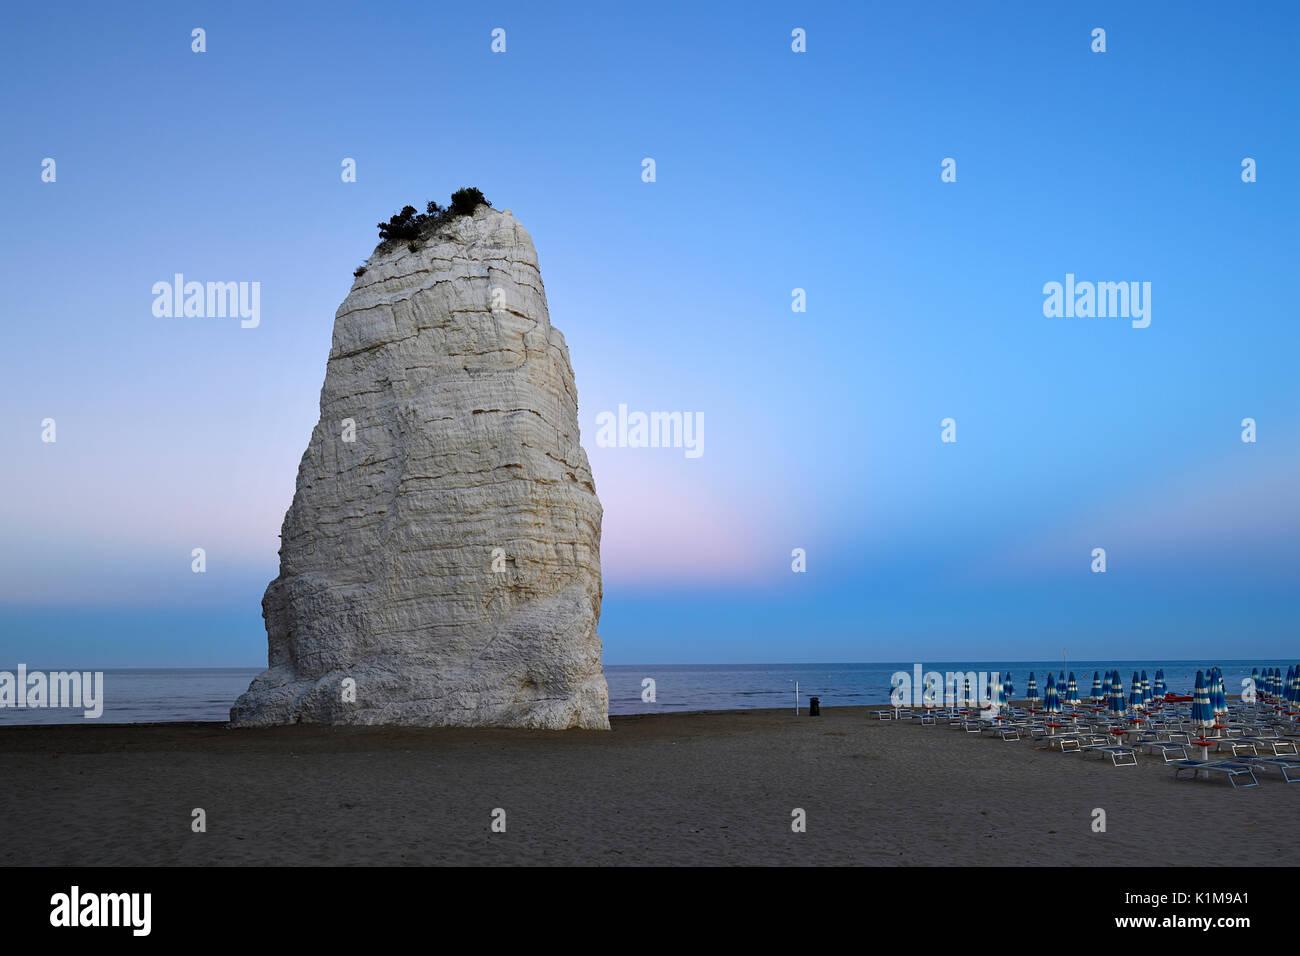 Pizzomunno, limestone cliffs on the beach, landmark of Vieste, Gargano, Foggia Province, Apulia, Italy - Stock Image